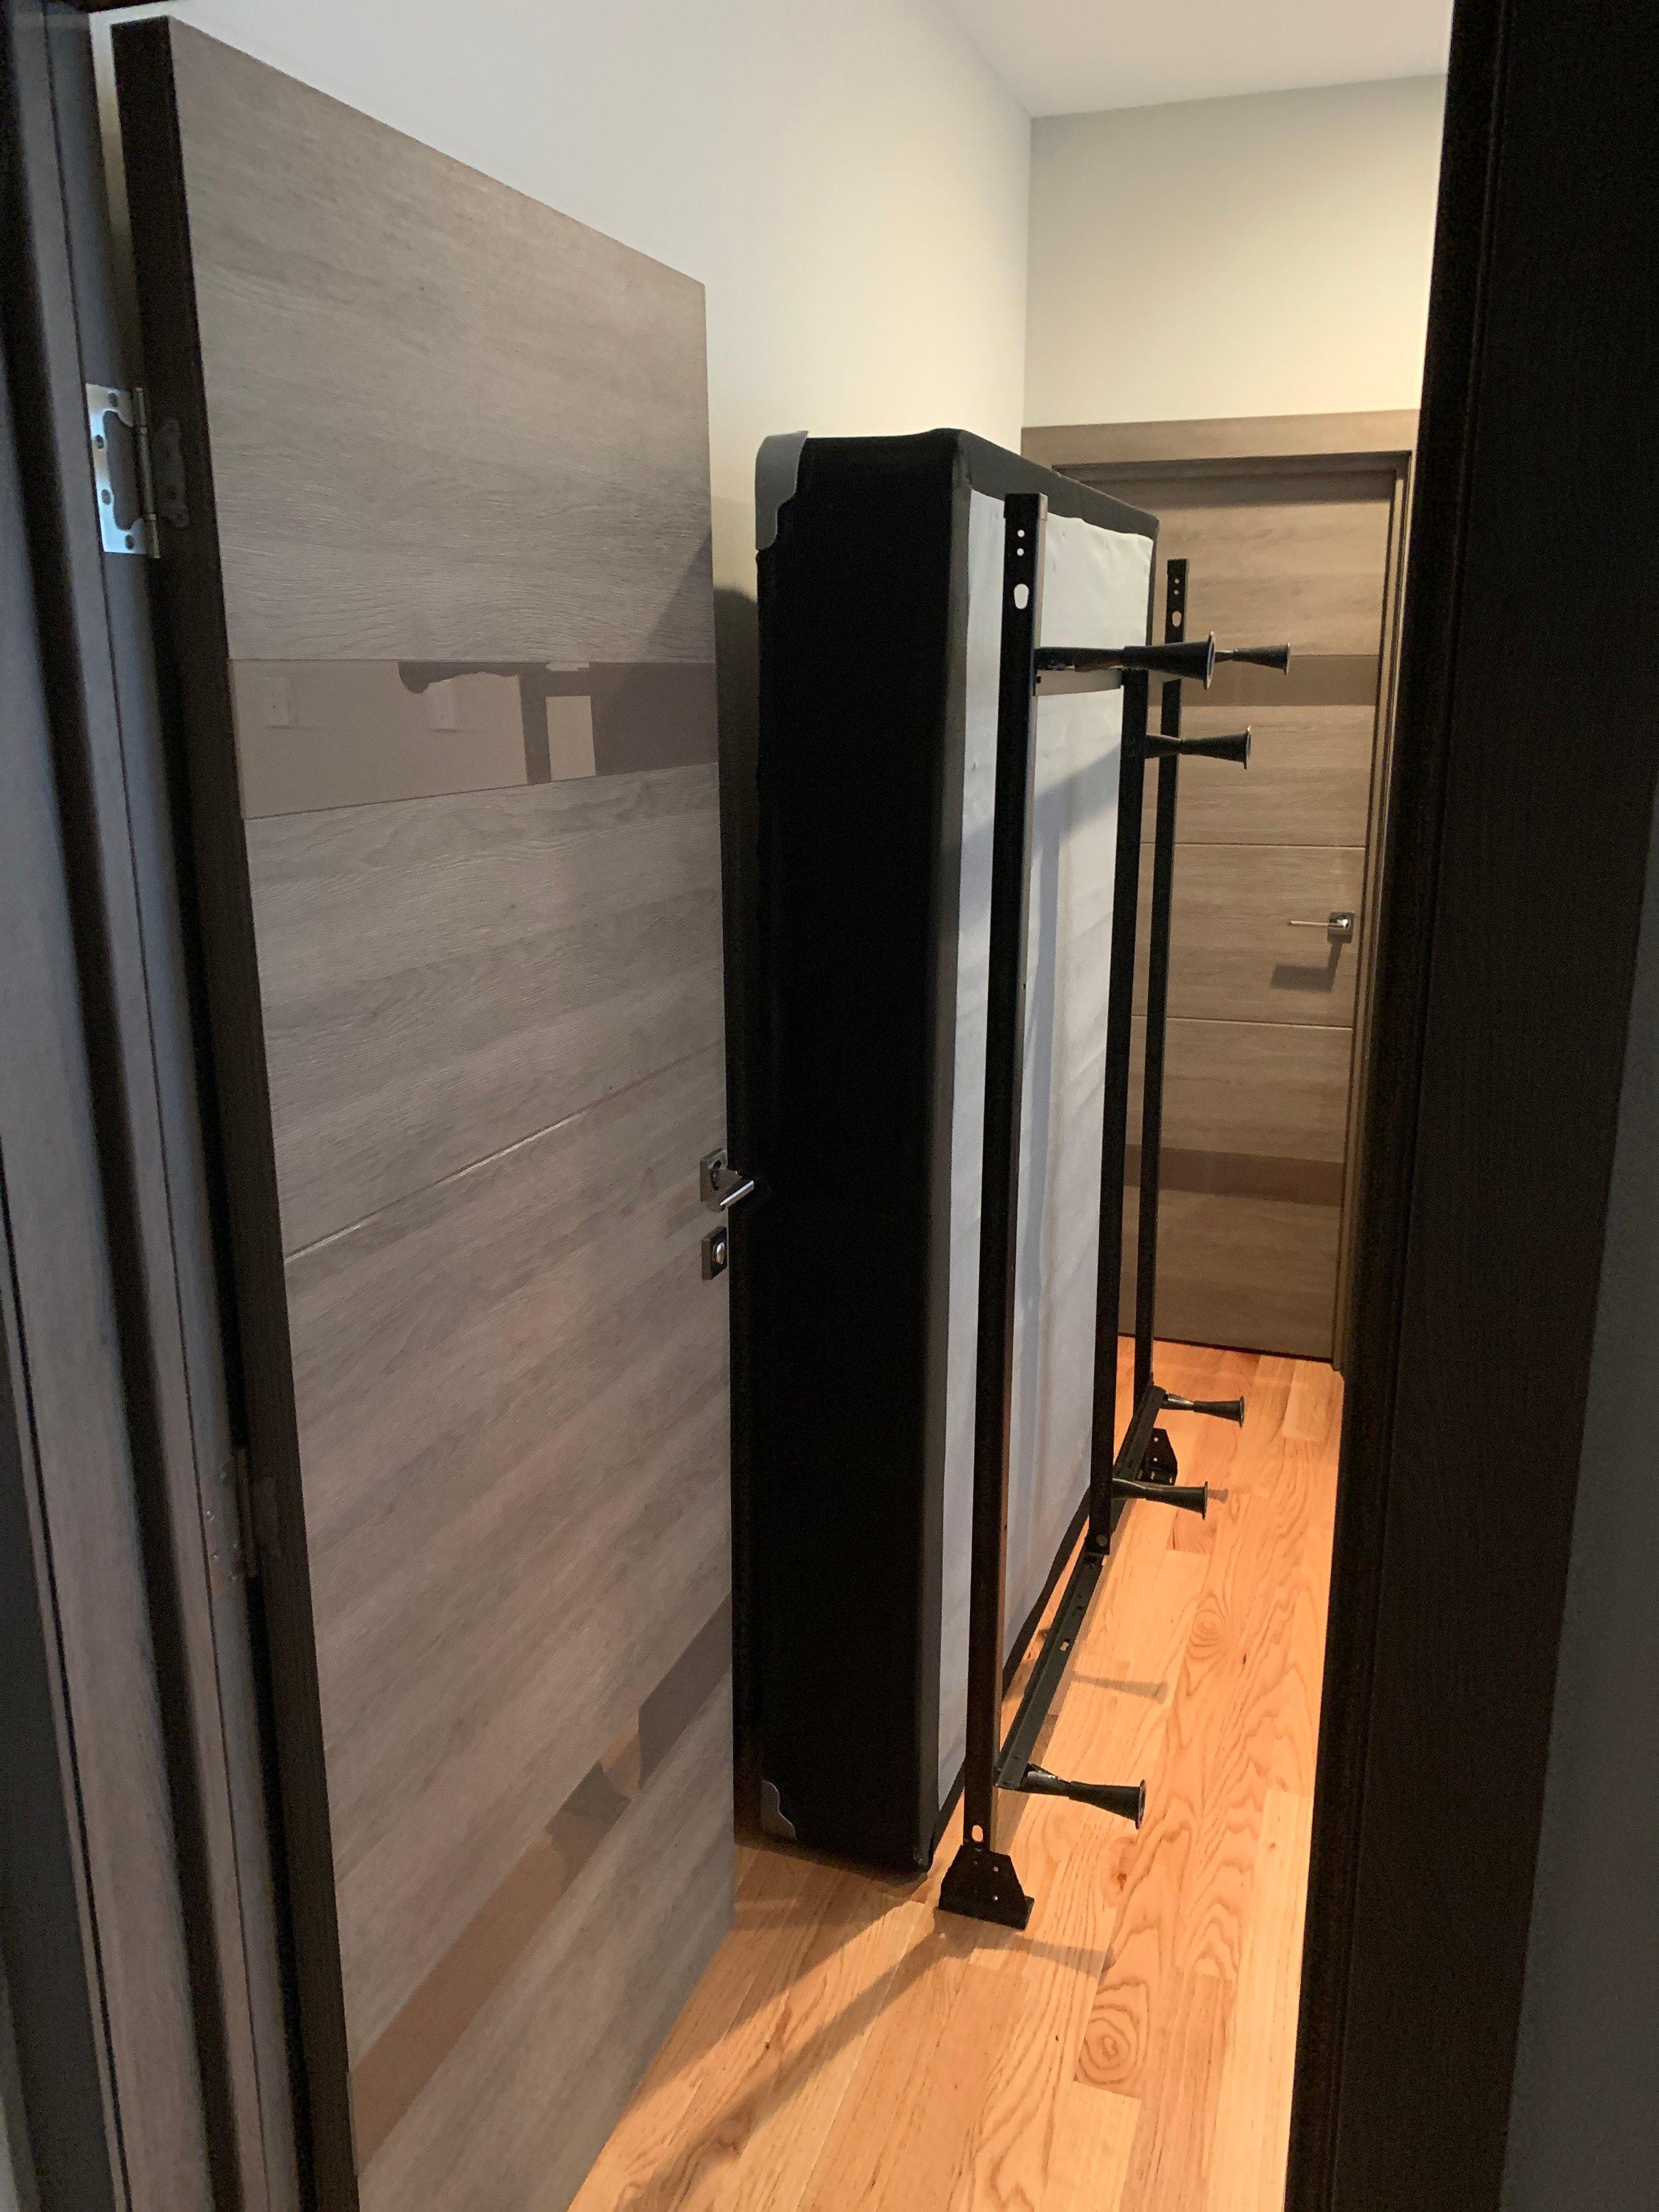 15x15 Bedroom self storage unit